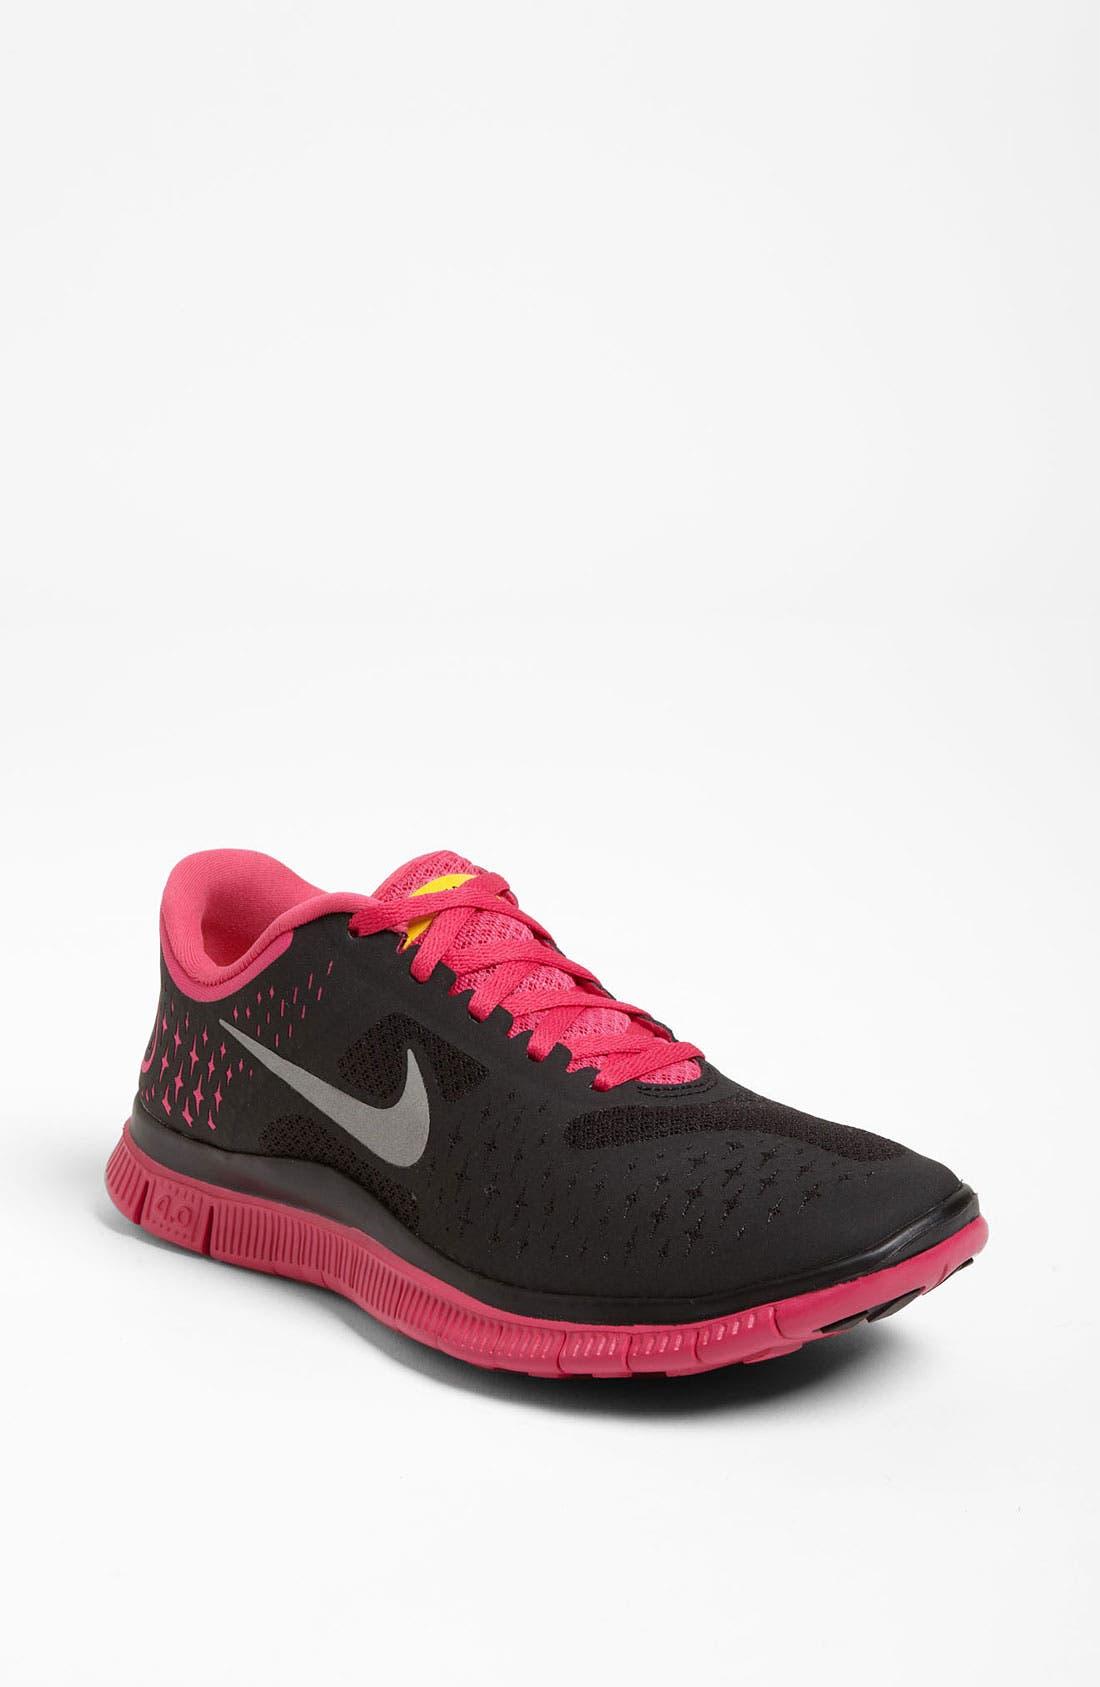 Main Image - Nike 'Free 4.0 V2 Livestrong' Running Shoe (Women)